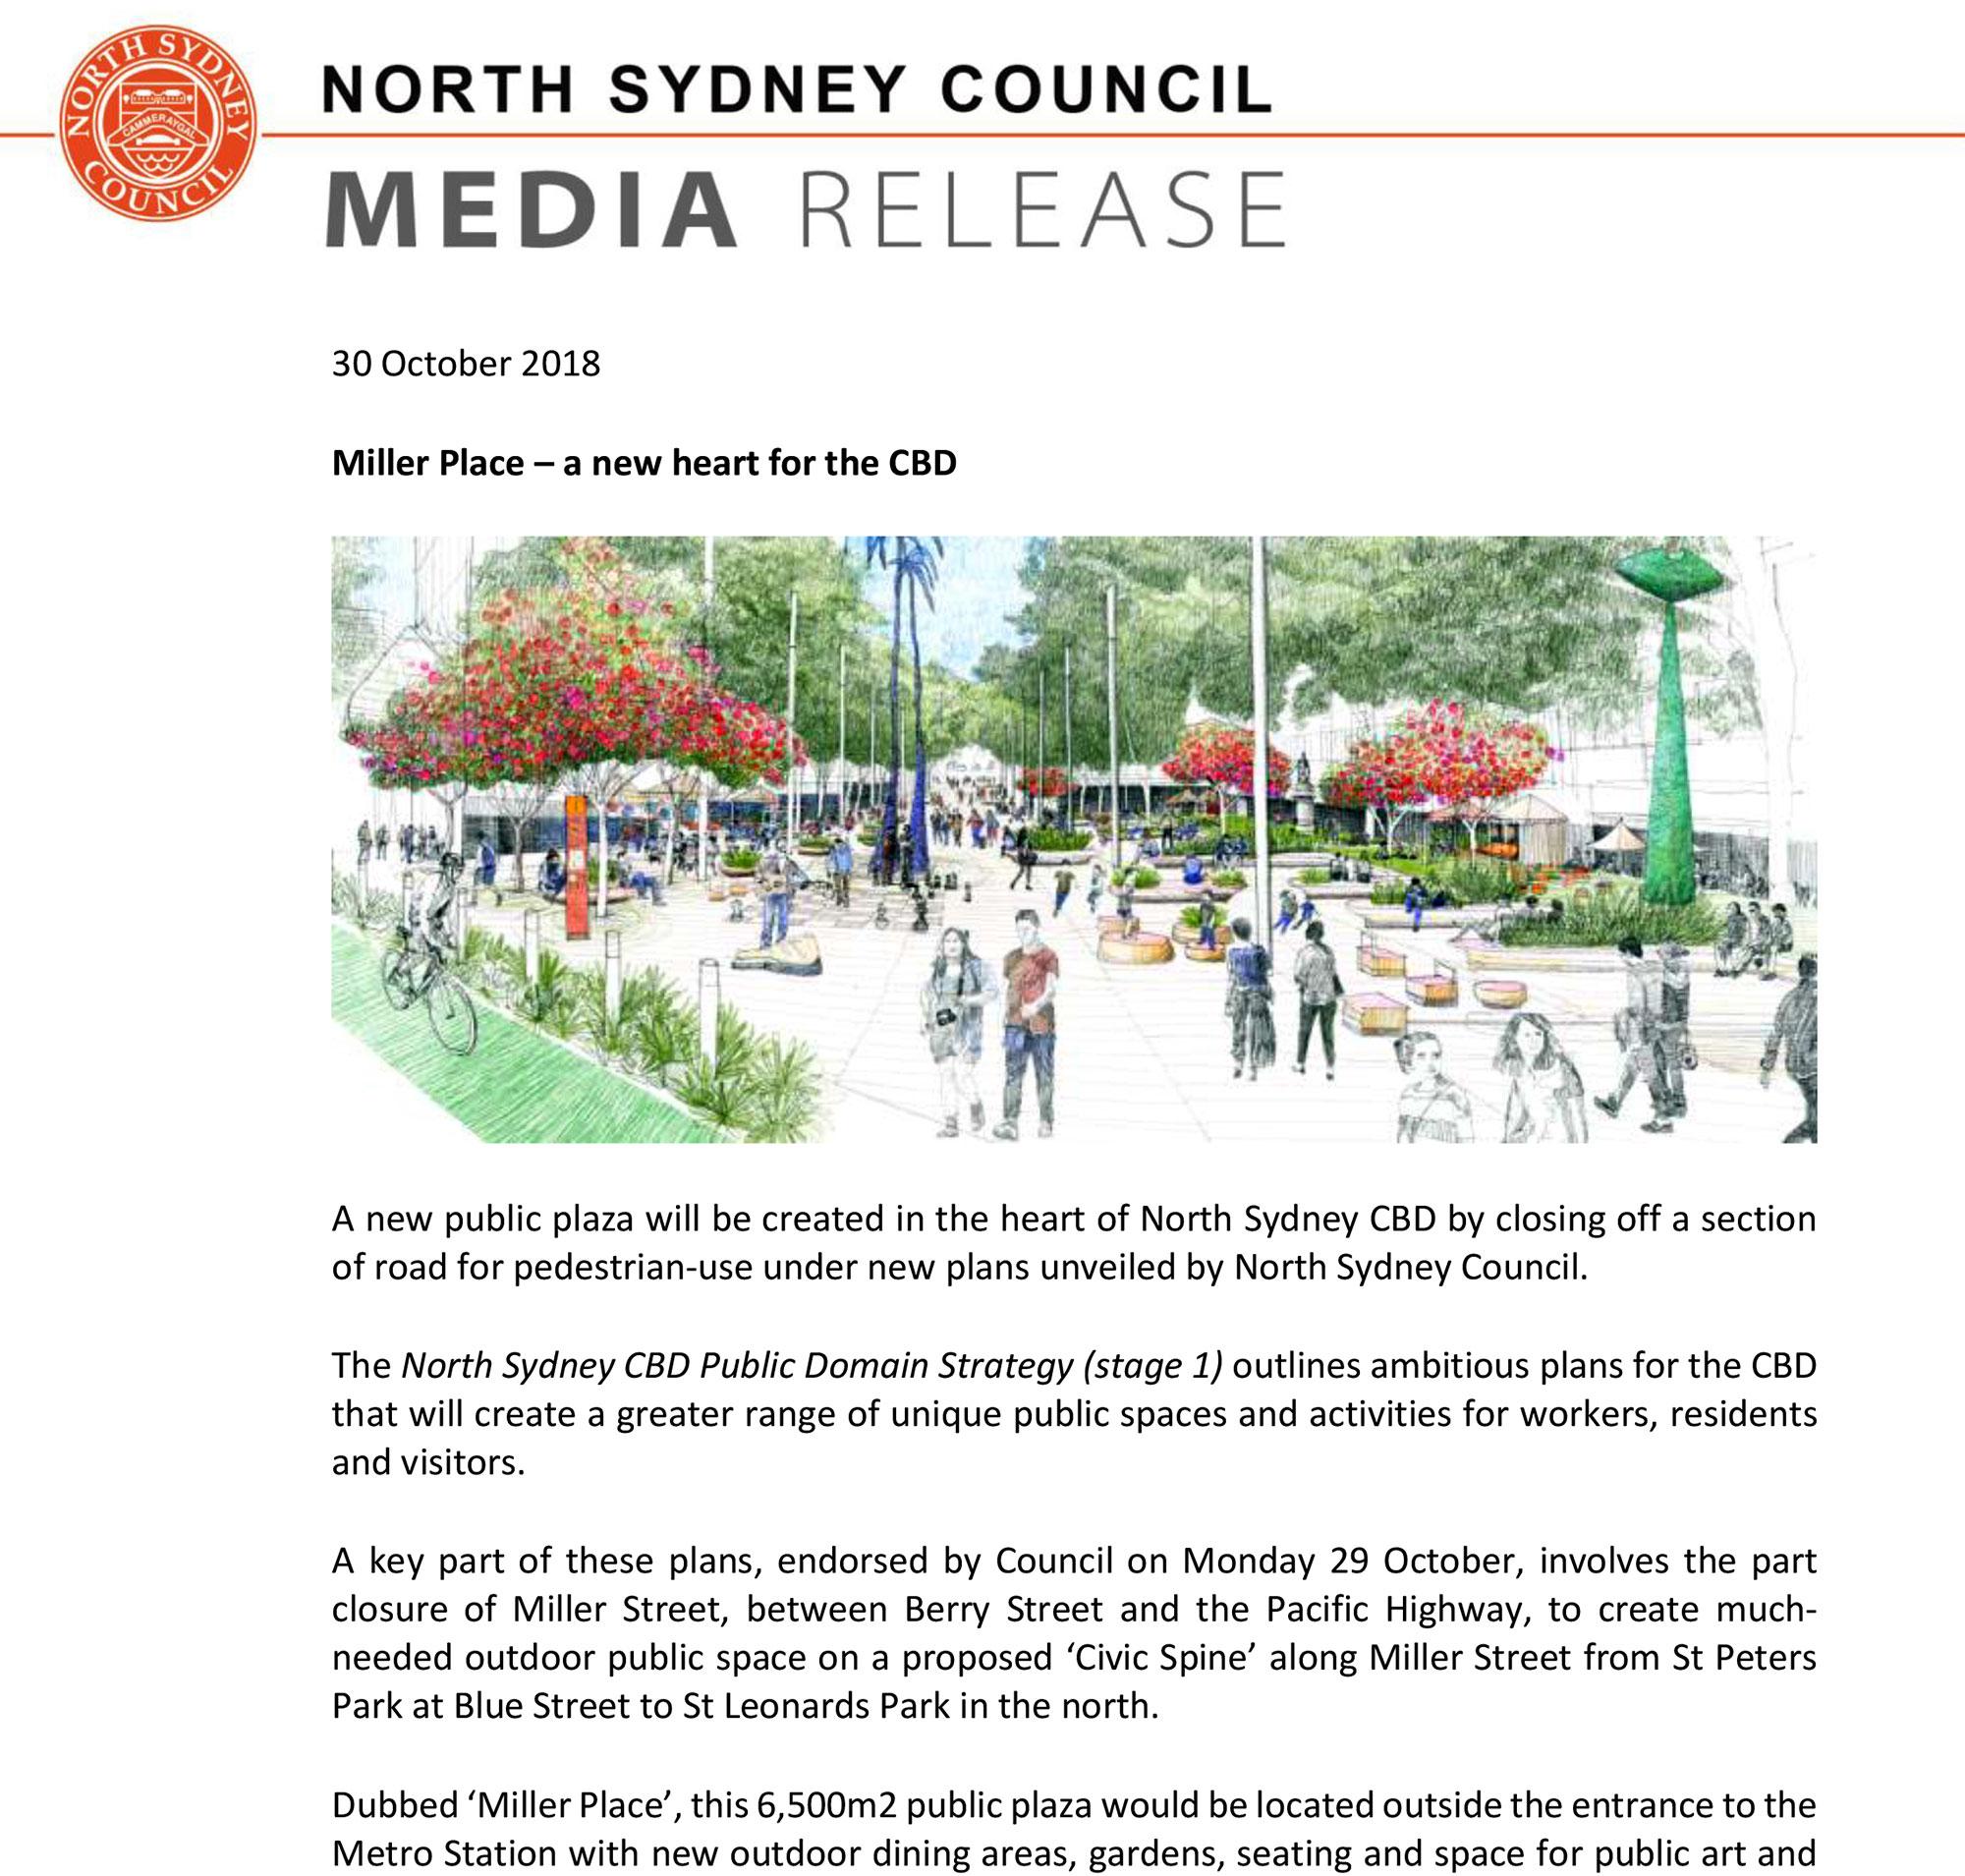 Picture: North Sydney Council